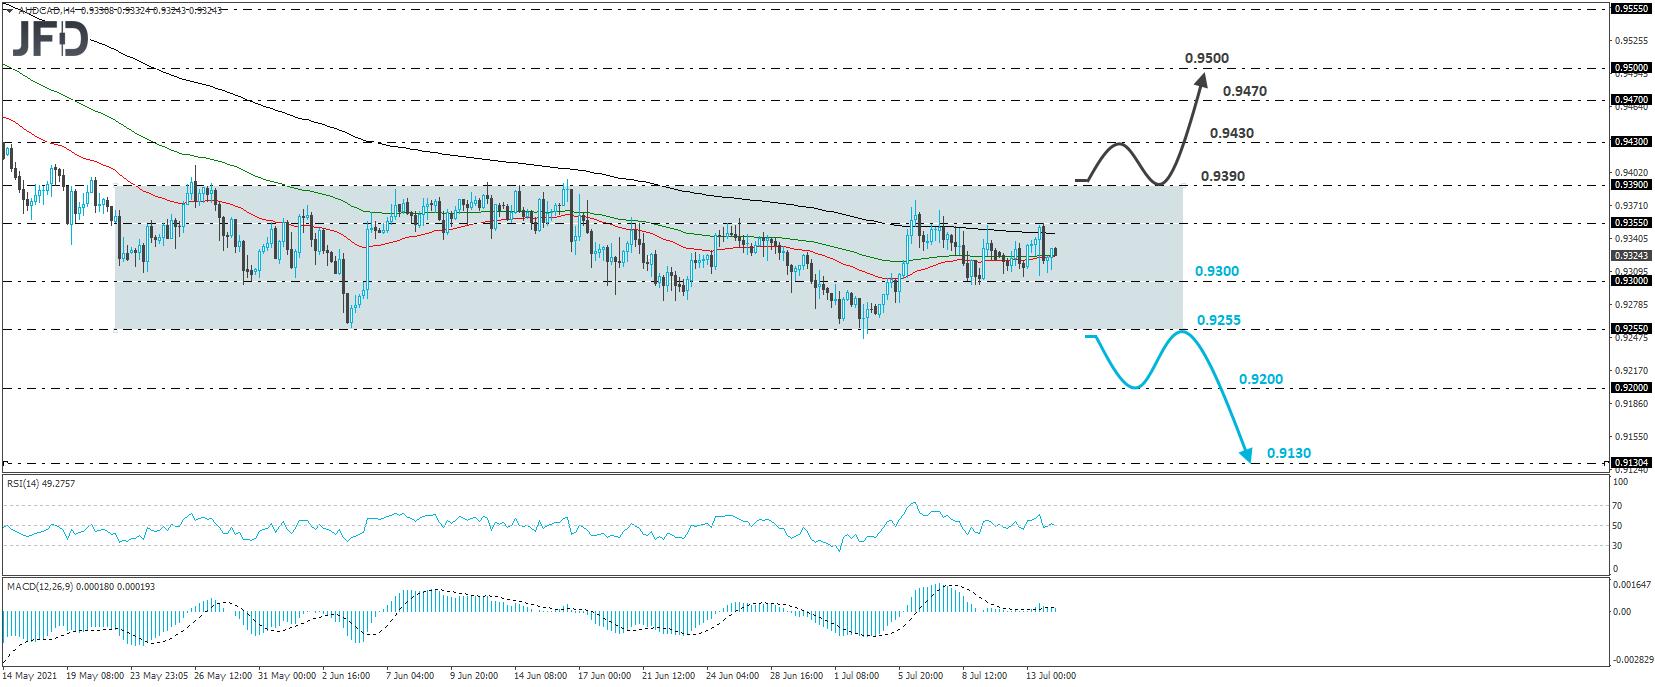 AUD/CAD 4-hour chart technical analysis